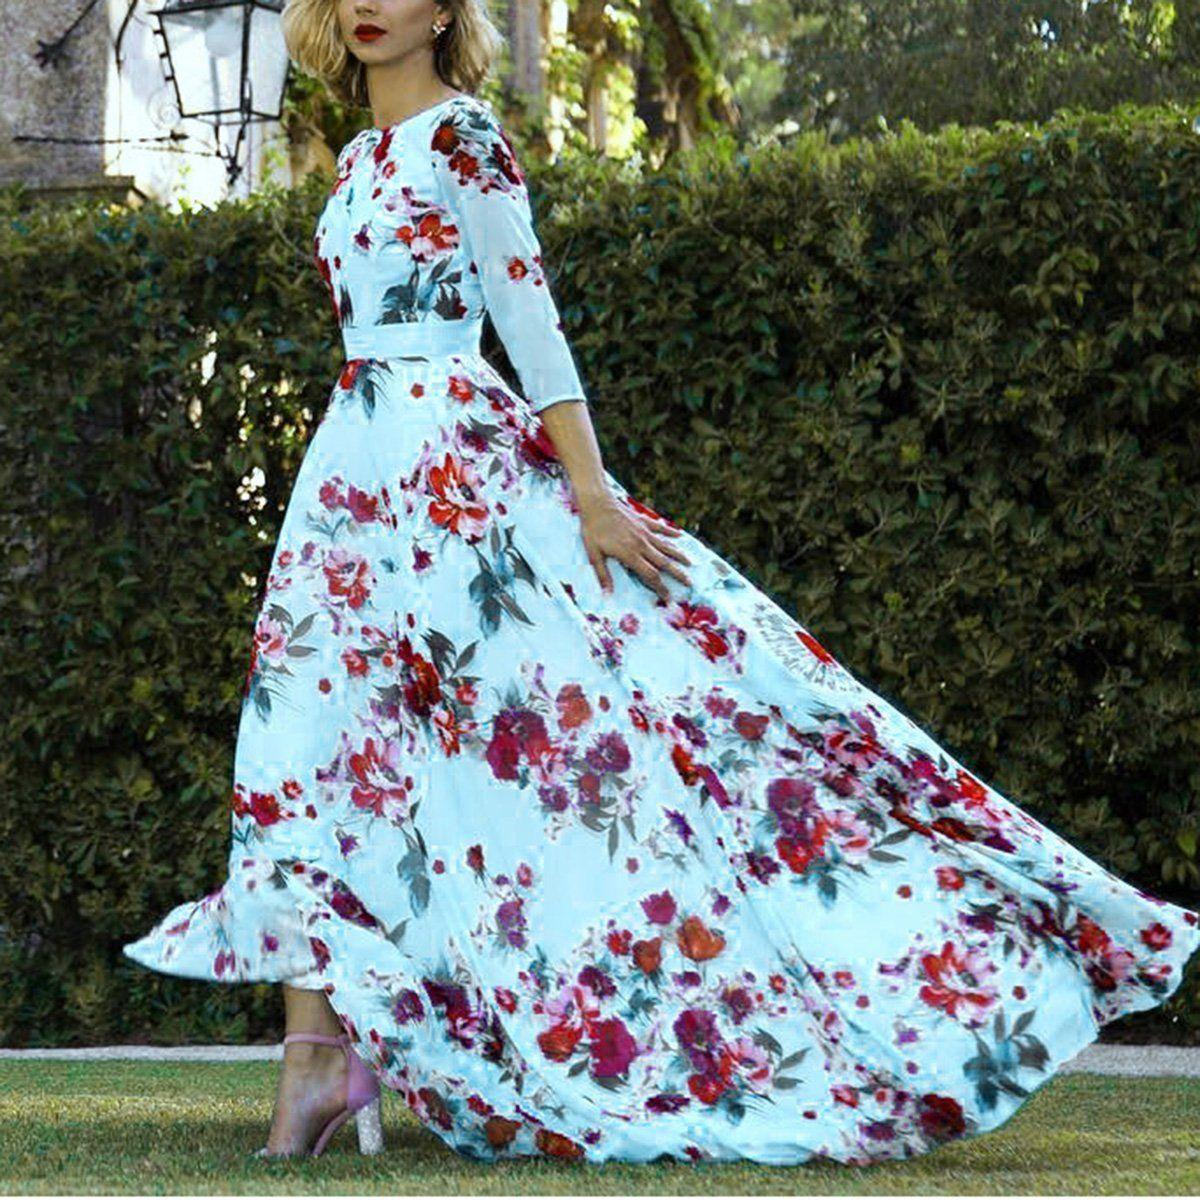 Elegant Floral Maxi Vacation Dress In 2021 Bohemian Style Summer Dresses Floral Print Maxi Dress Womens Maxi Dresses [ 1200 x 1200 Pixel ]